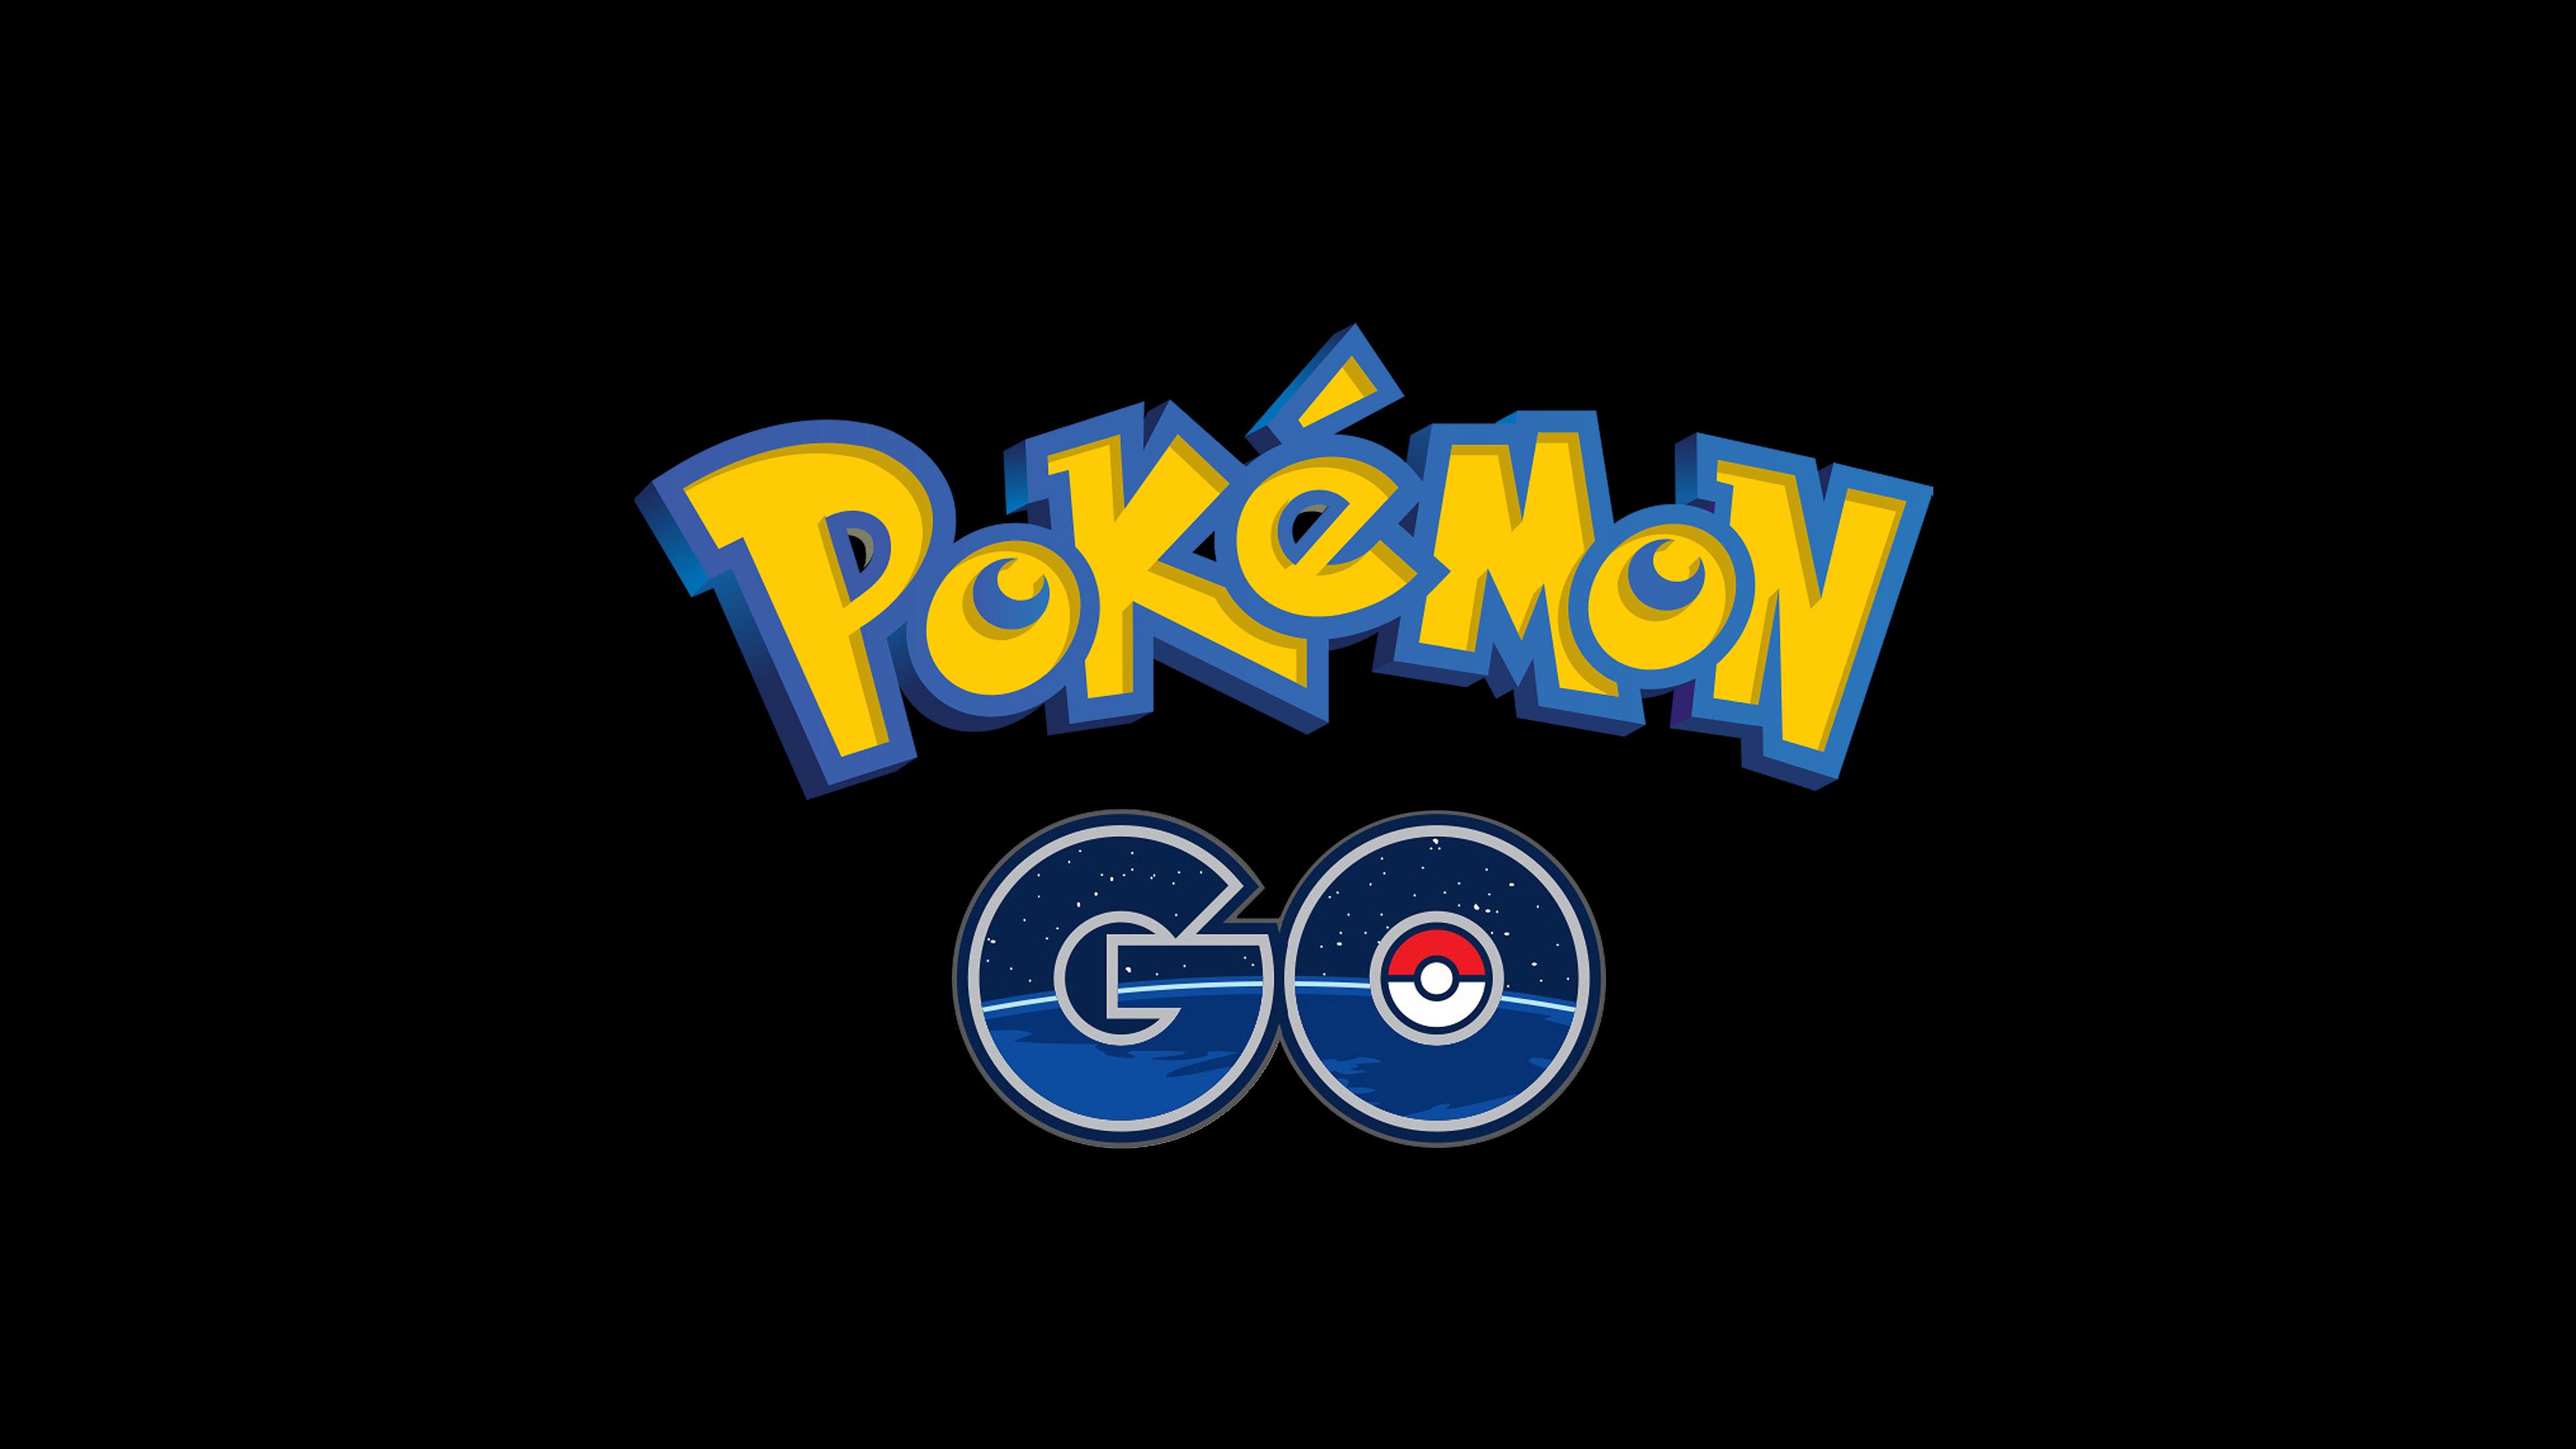 Pokemon Go Wallpaper 11